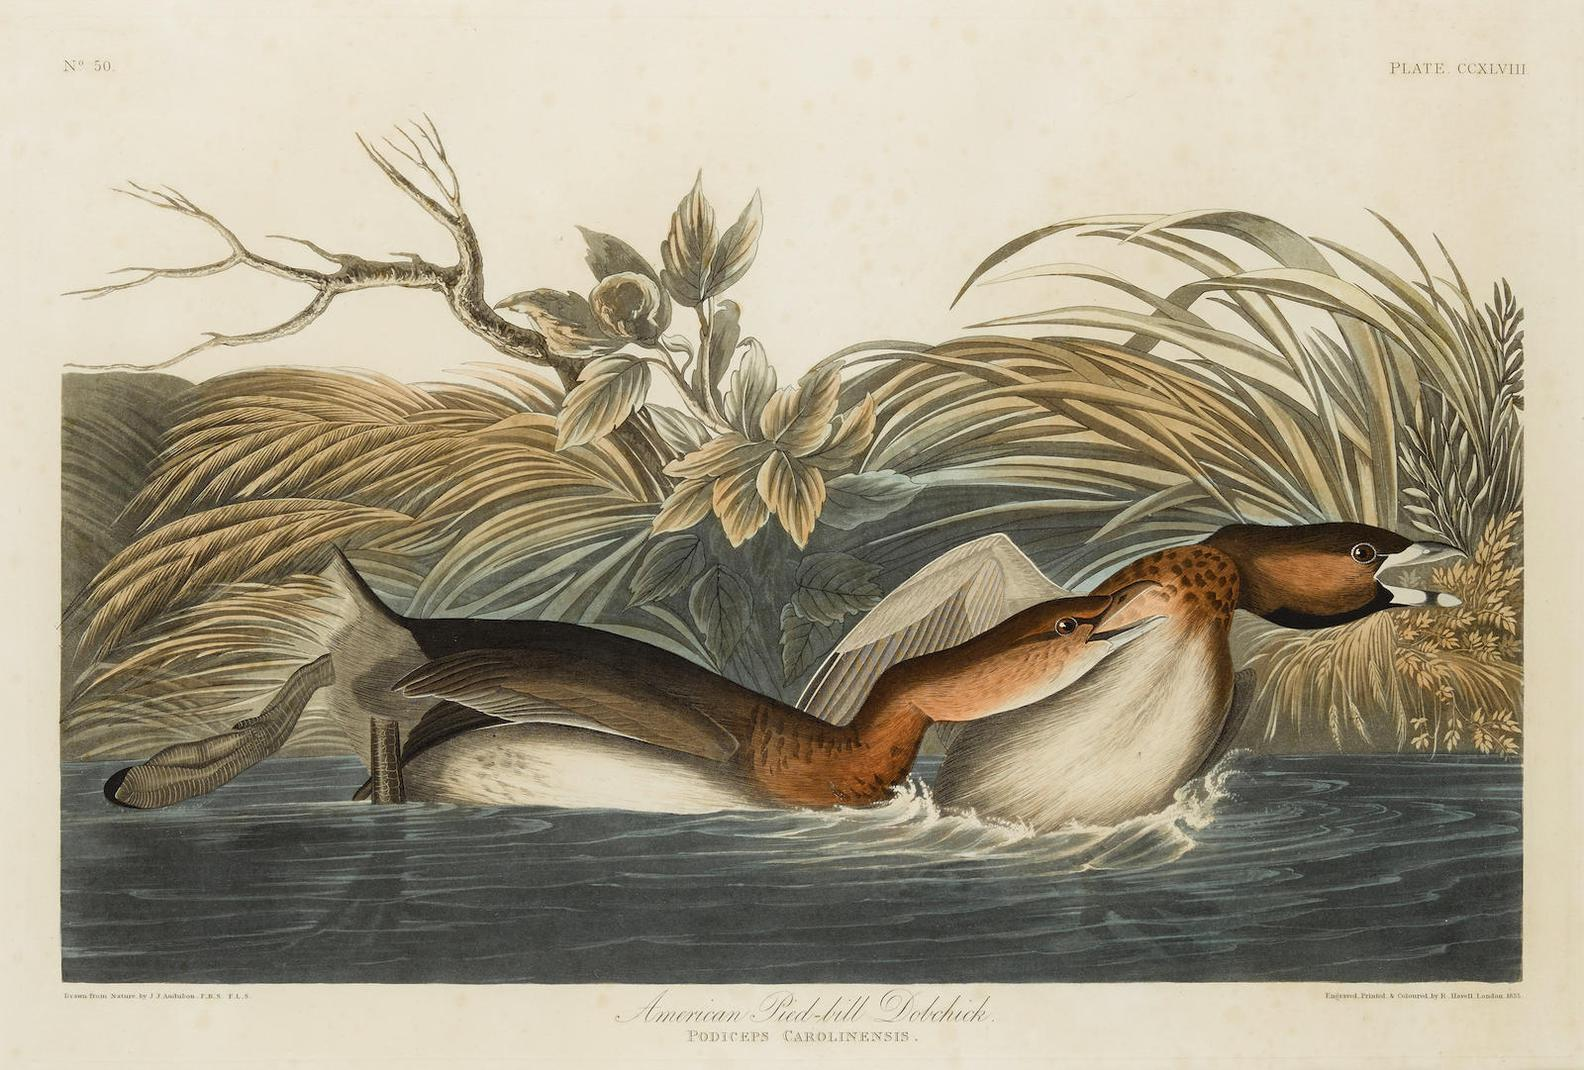 After John James Audubon - American Pied-Bill Dobchick (Pl. CCXLVIII)-1855